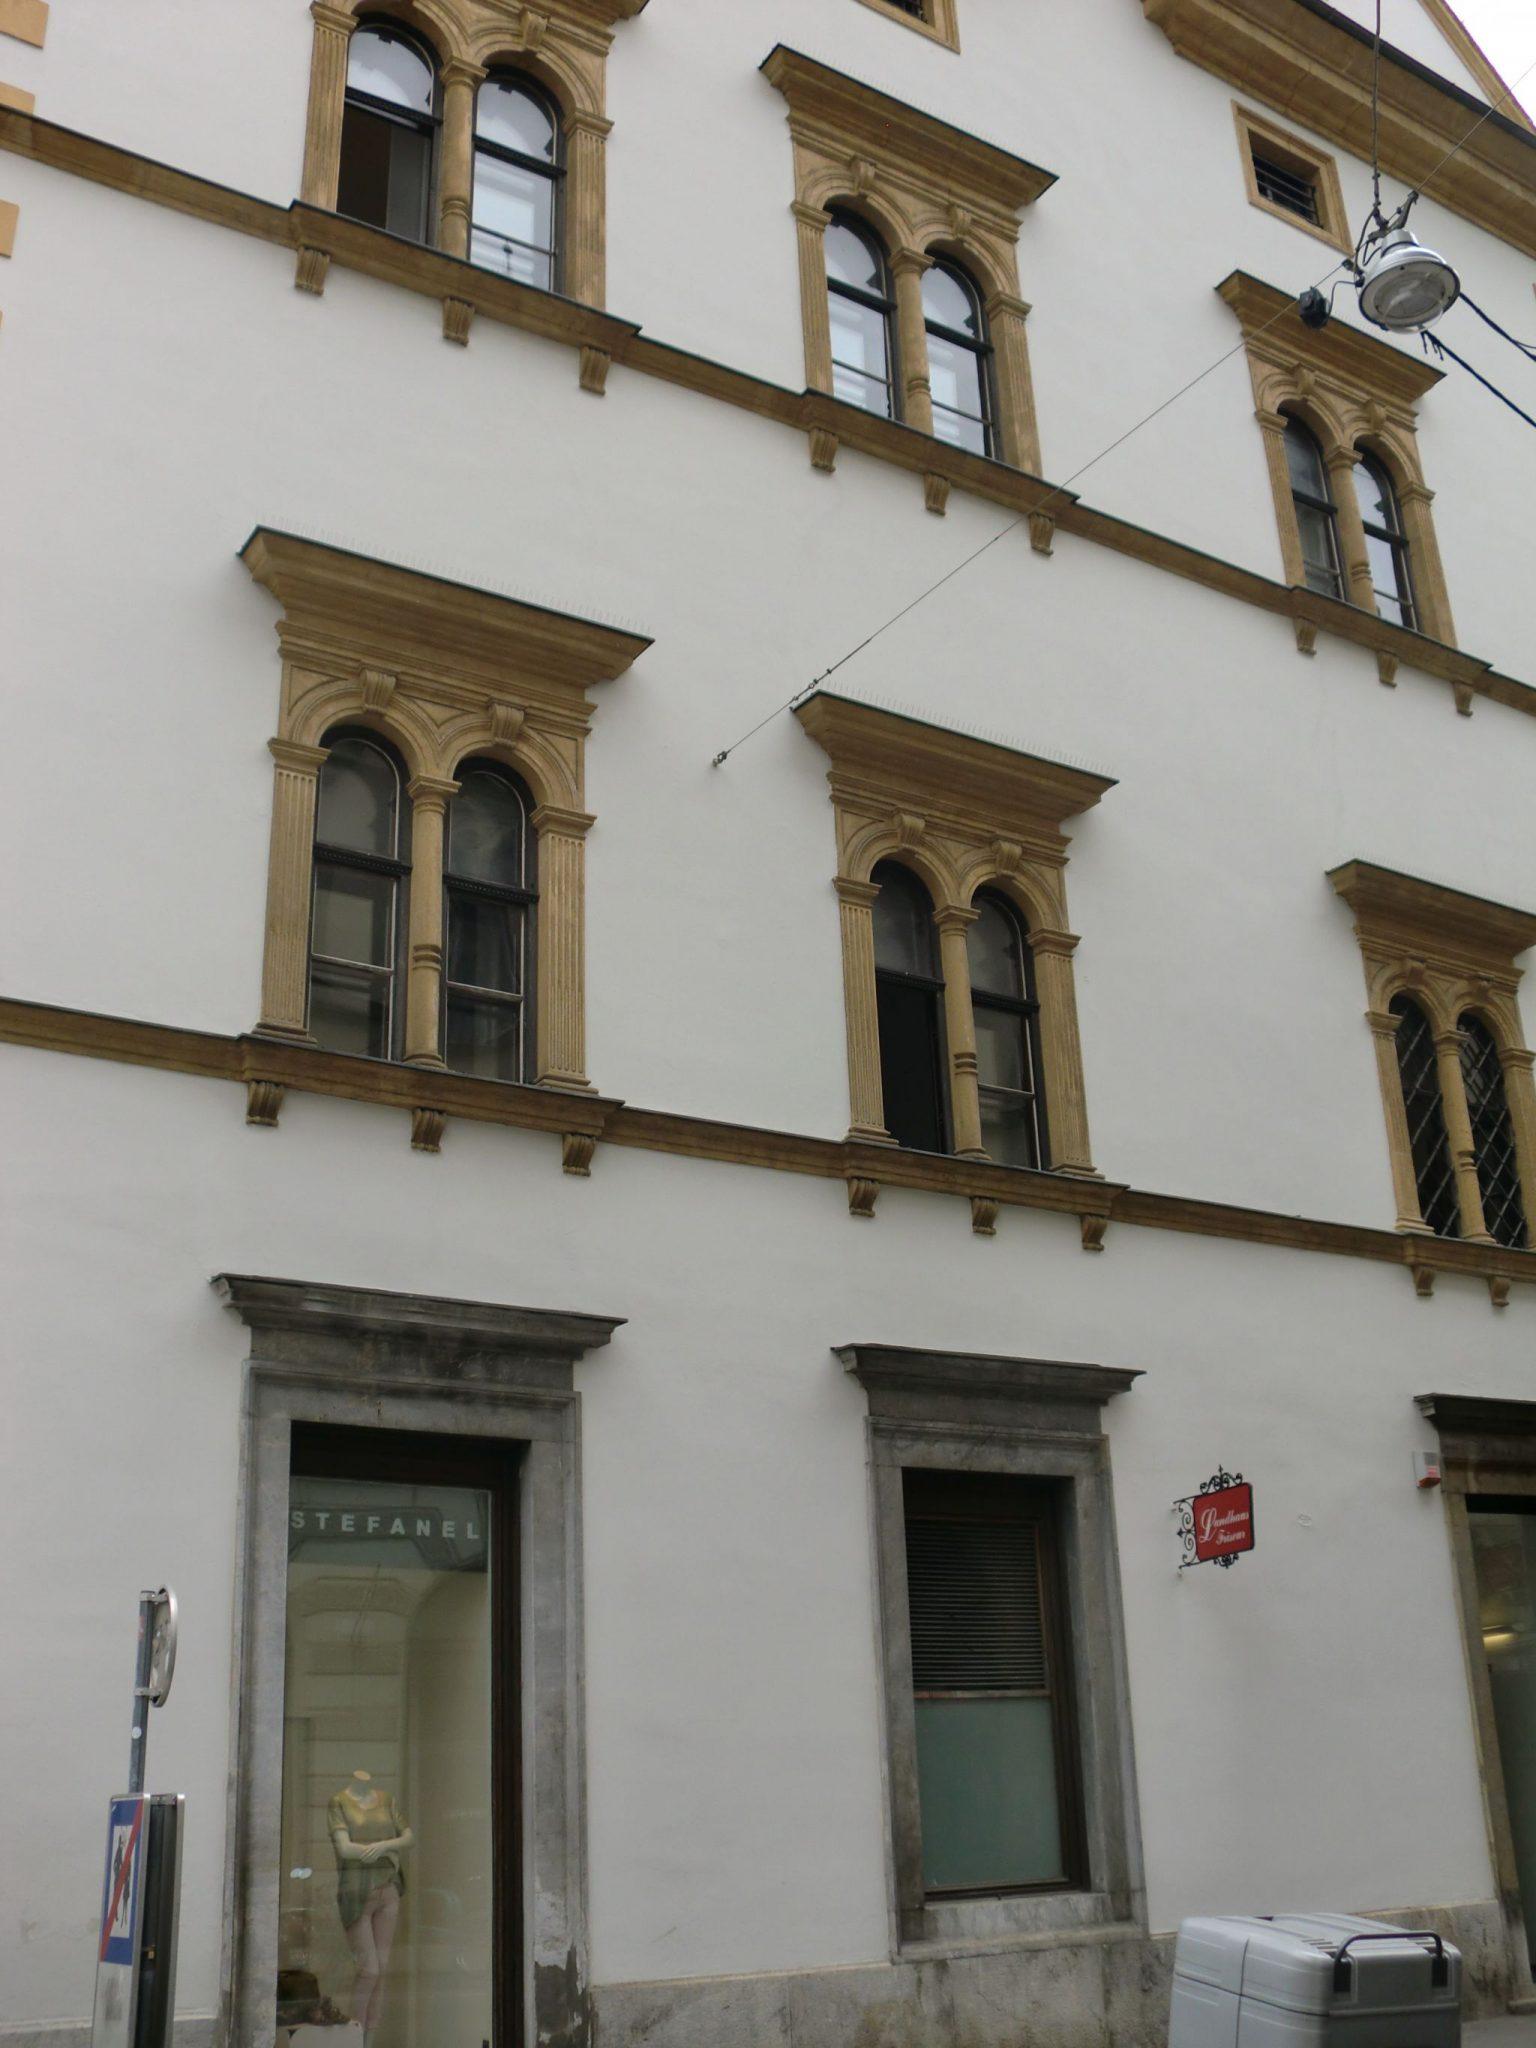 Graz museum entrance 0 - Graz: tradition and modernity